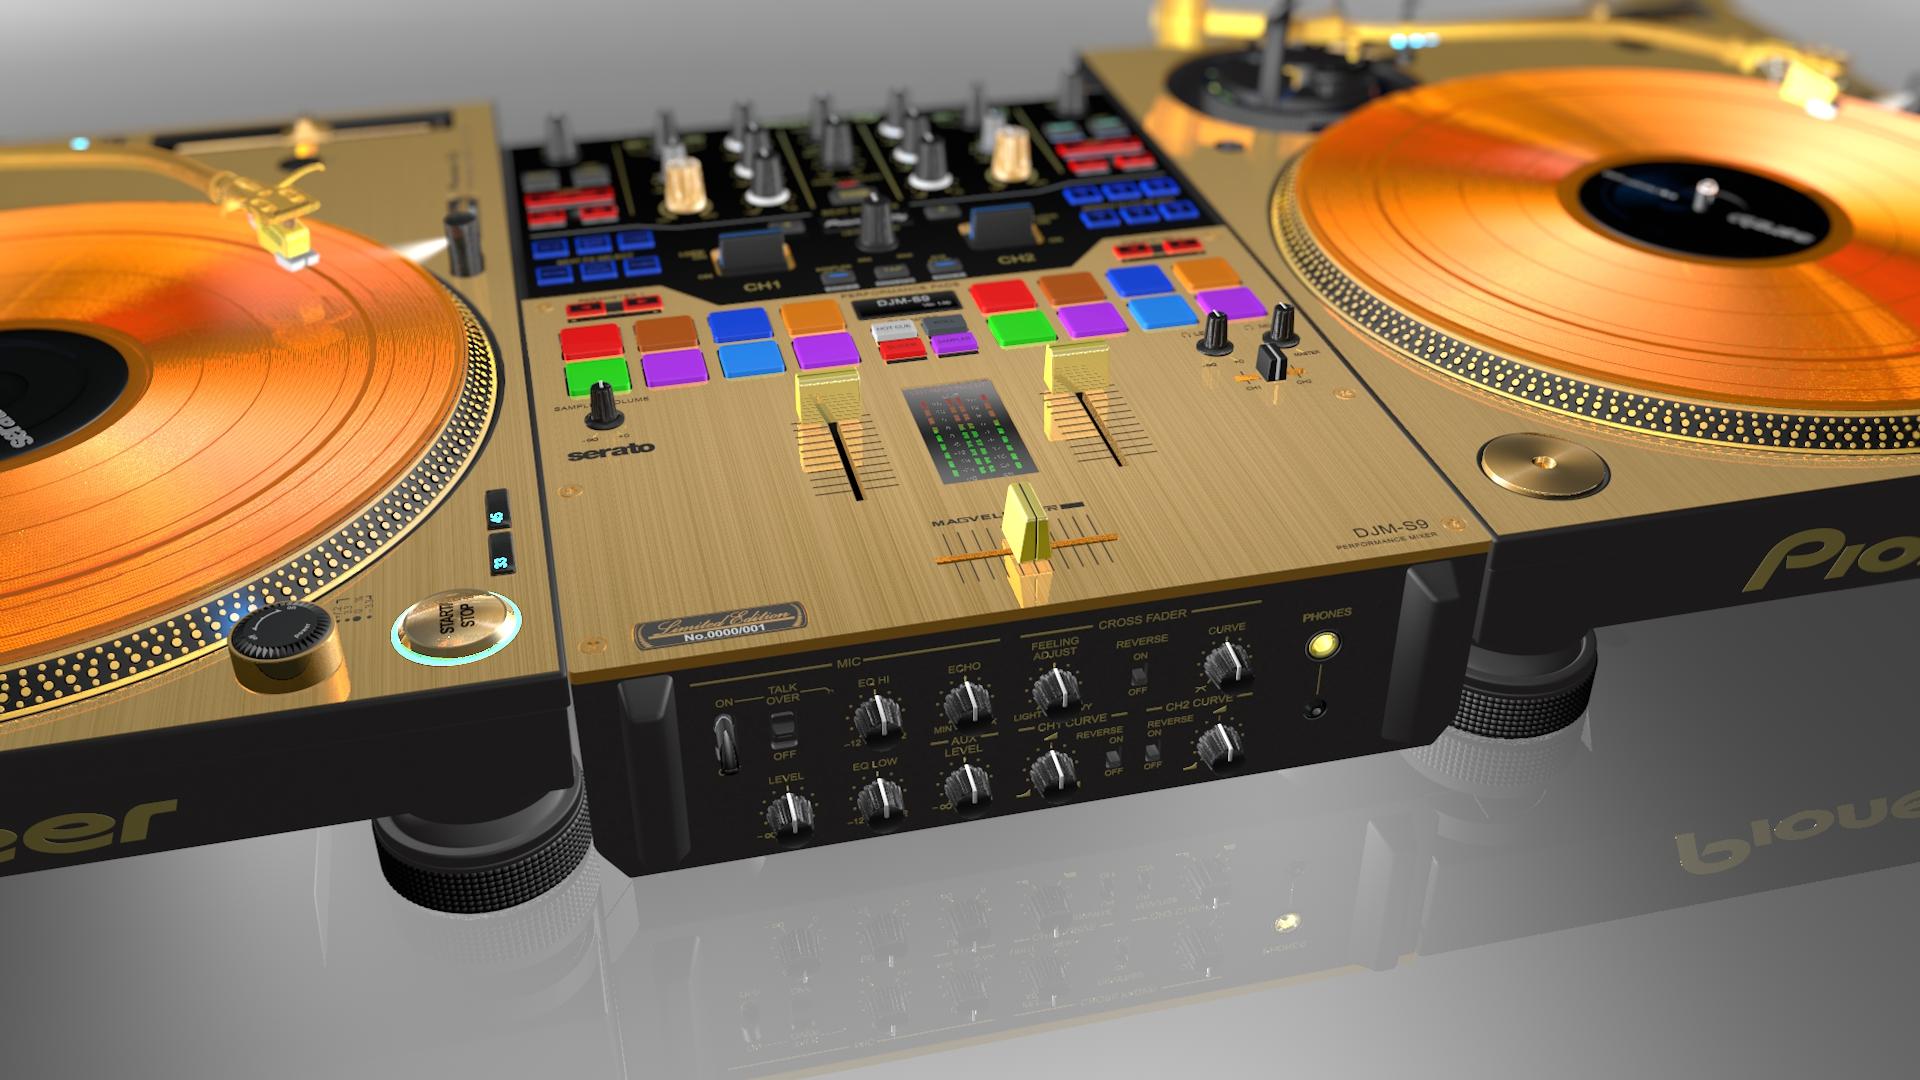 Realistic Gold Prodj Turntable Pioneer Plx1000 Amp Mixer Djm